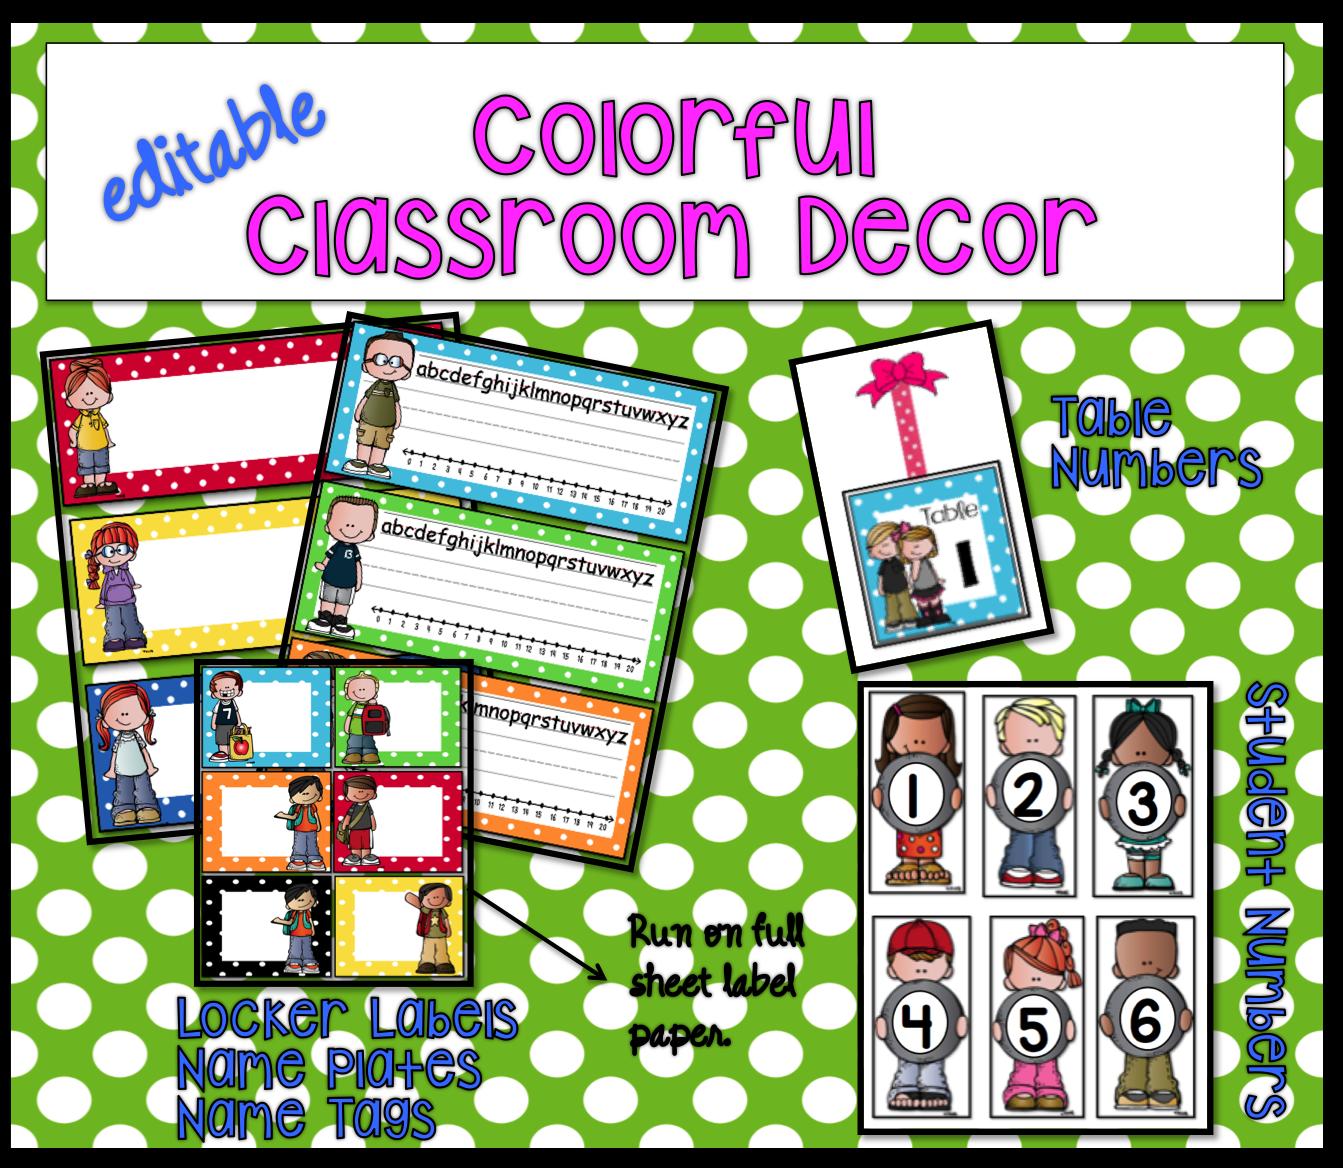 Hip Classroom Decor ~ St grade hip hooray classroom decor with a colorful